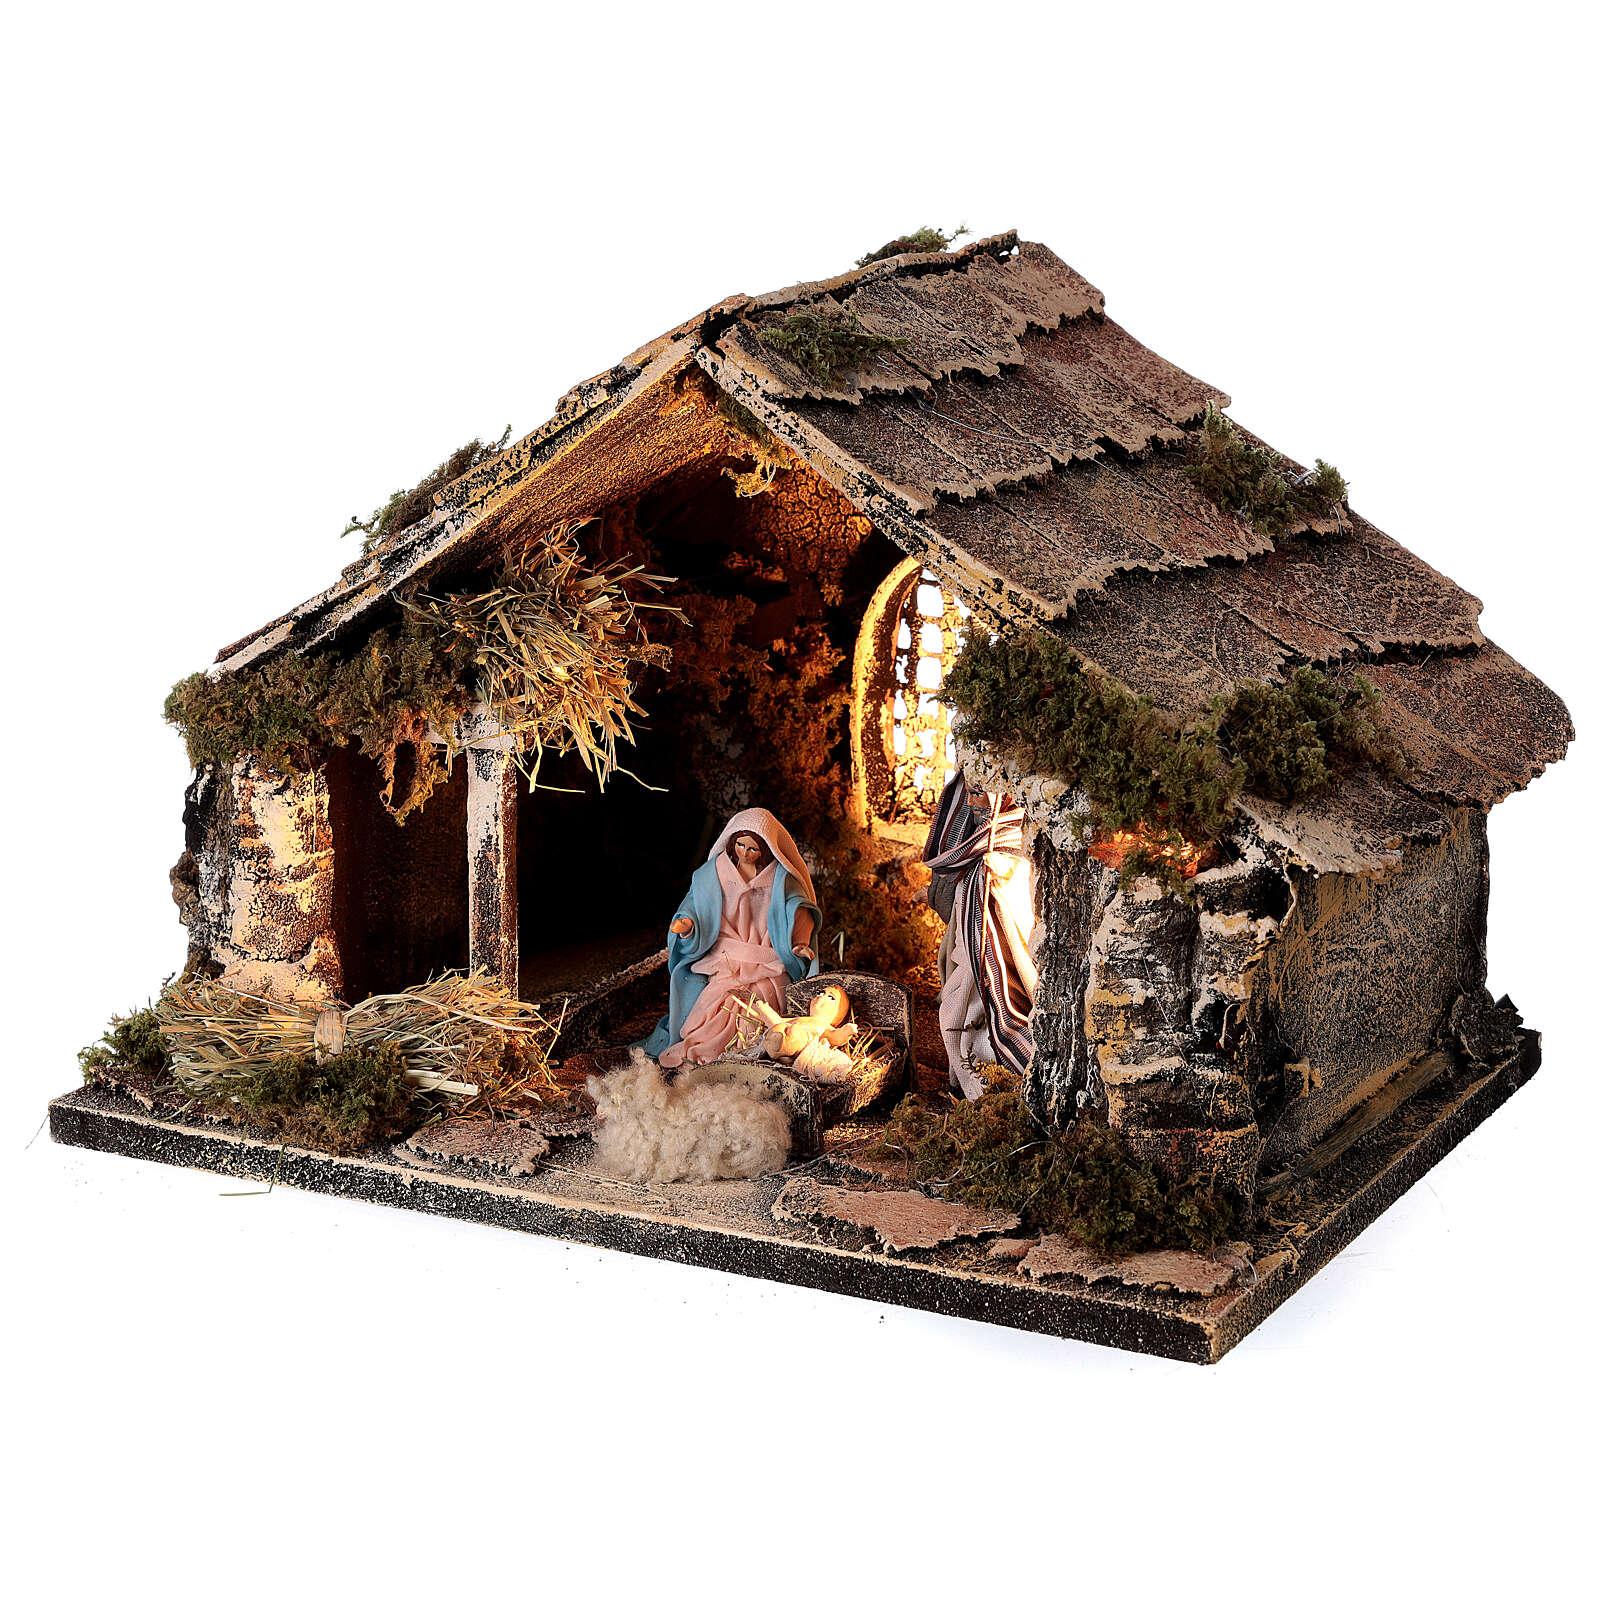 Stable with Holy Family set 8 cm window Neapolitan nativity 20x30x20 cm 4